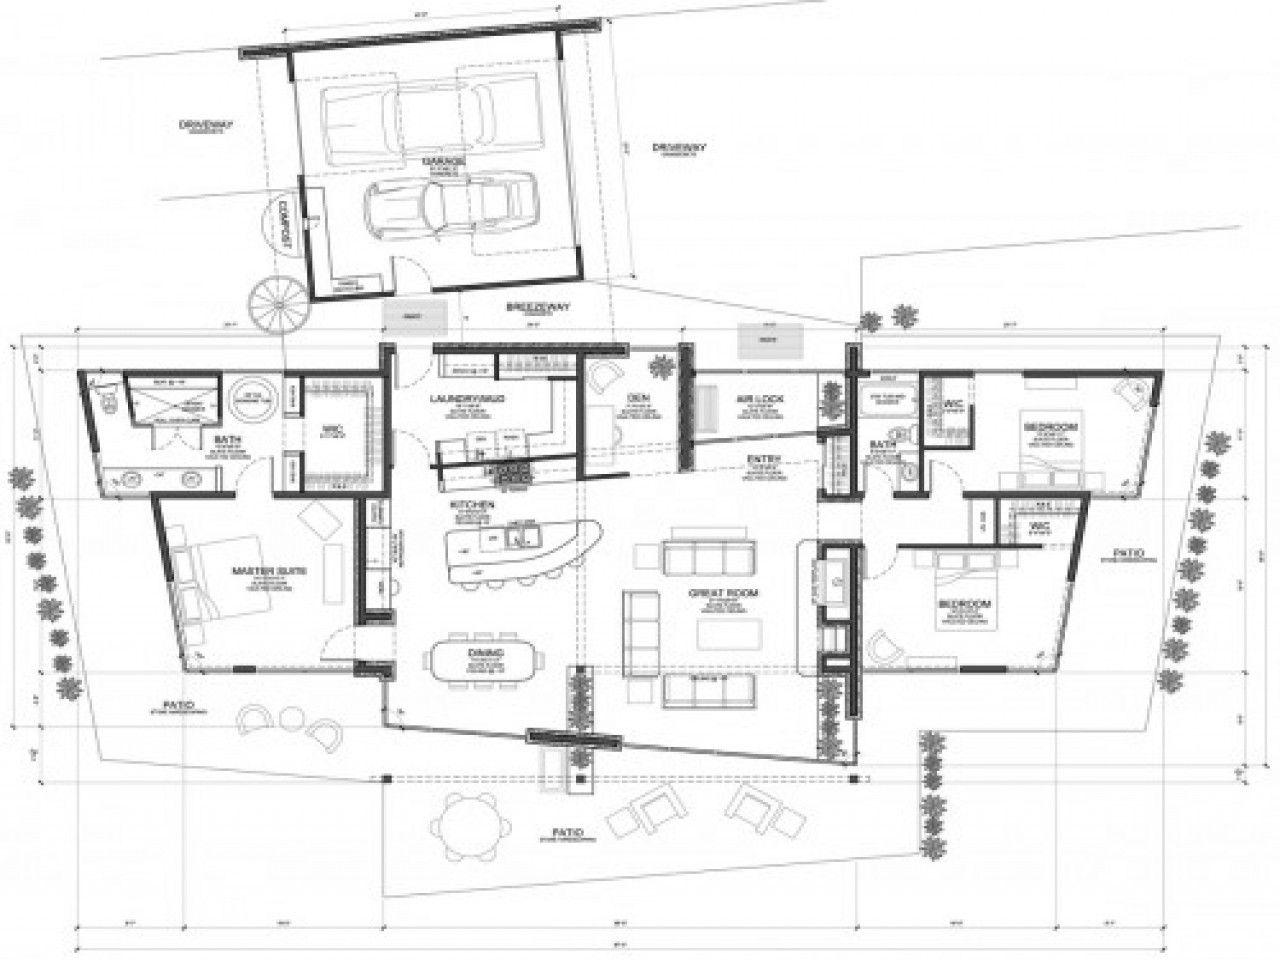 Contemporary Mountain House Plans Wonderful Modern House Plans Concrete House Plan Colle Modern House Floor Plans Modern Floor Plans Small House Design Plans